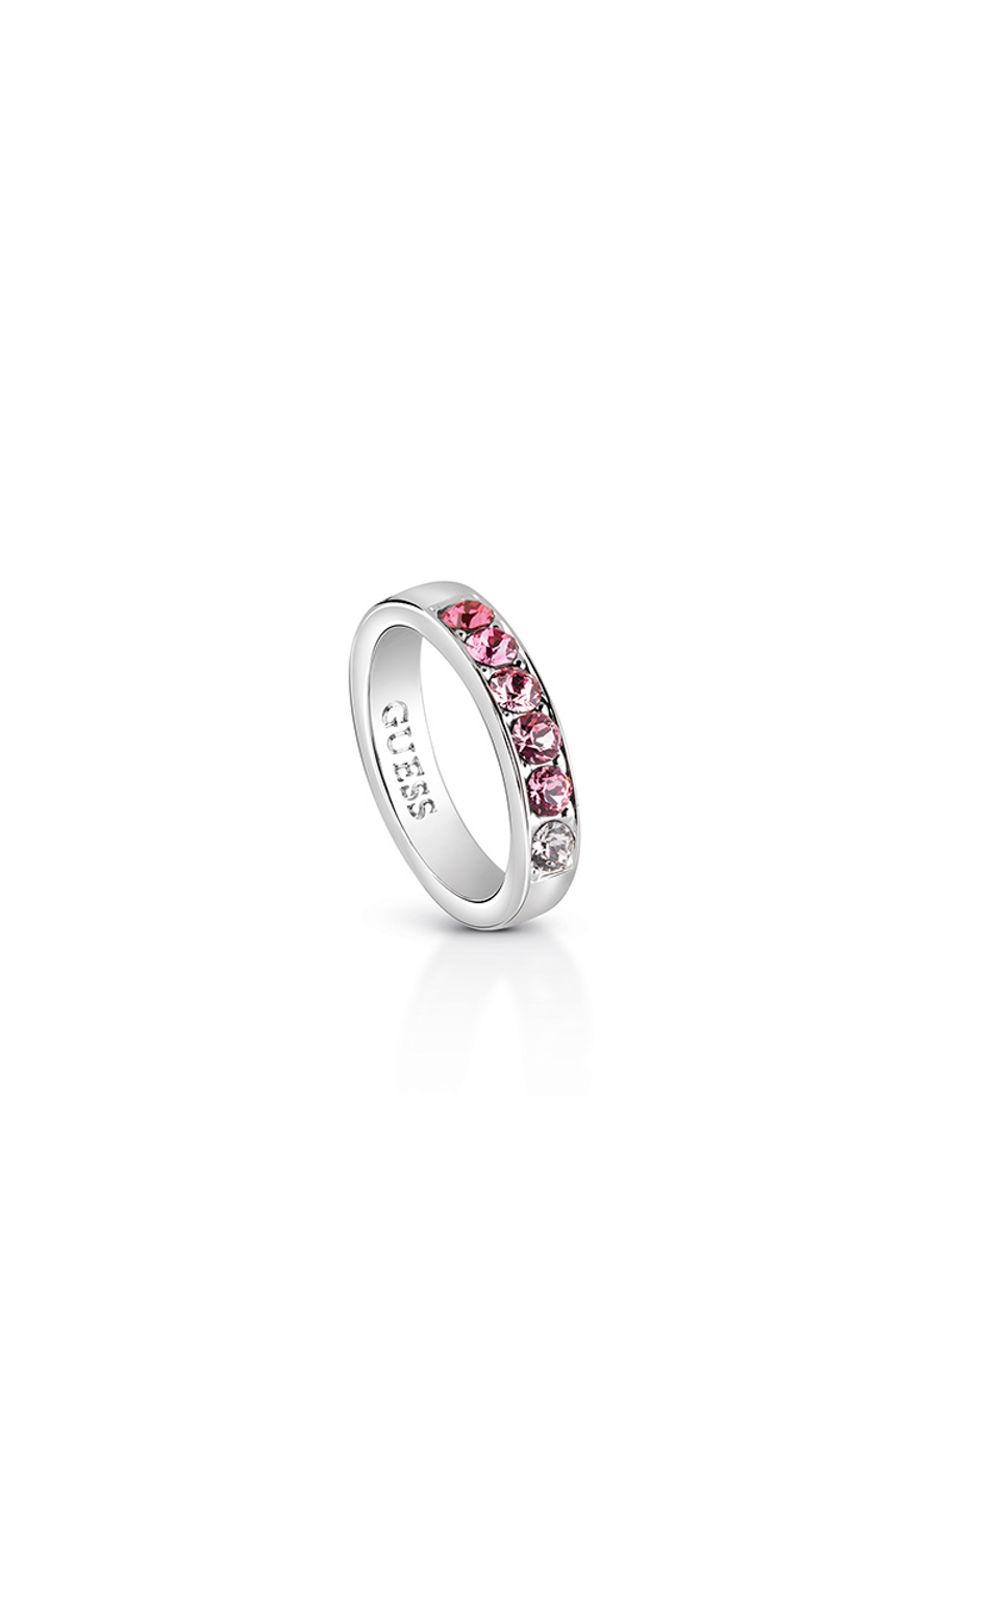 GUESS FAUX UBR83035-54 Ασημένιο Δαχτυλίδι Με Ροζ Πέτρες